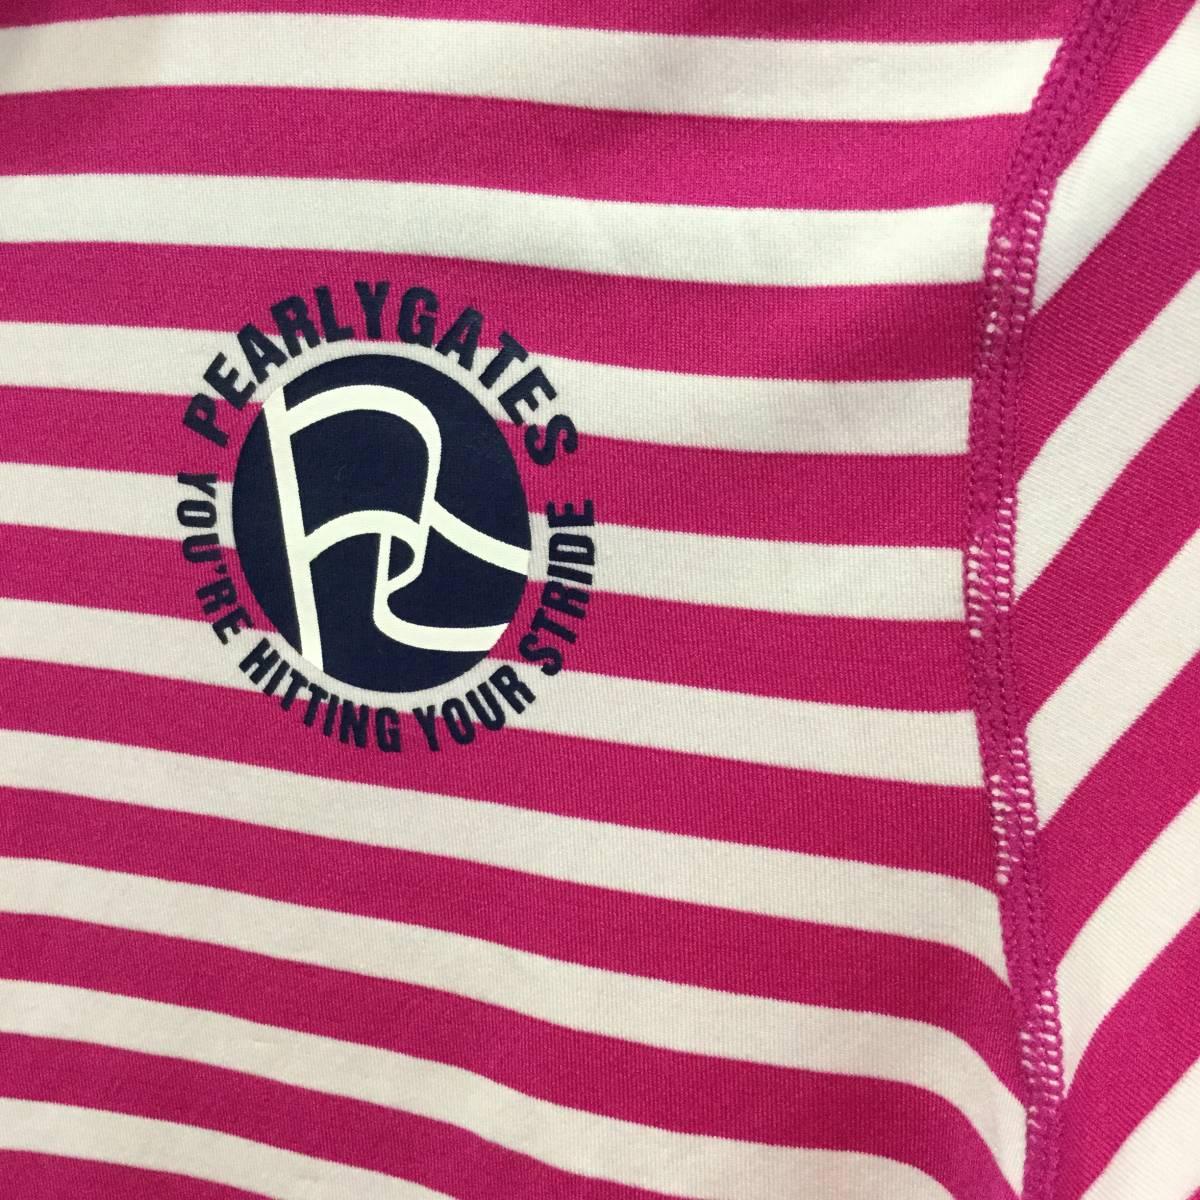 PEARLY GATES パーリーゲイツ ハイネックインナーシャツ サイズ2 *白×ピンク* ロゴ インナーシャツ レディース ゴルフウェア 長袖_画像5